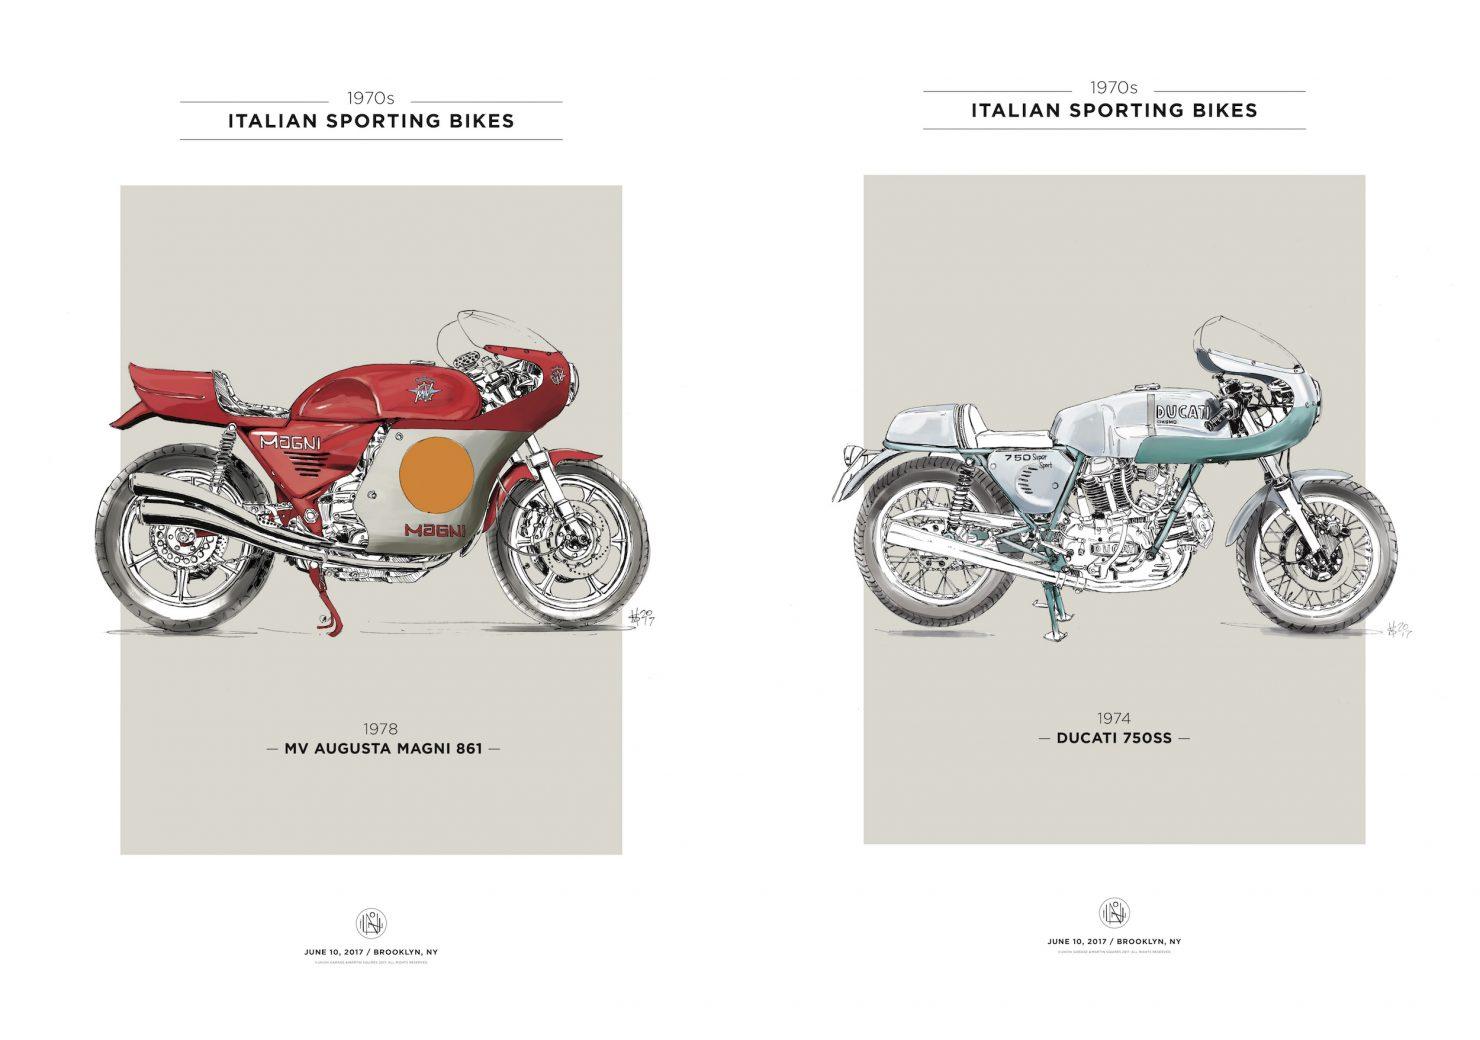 SB70S POSTER MV MAGNI copy 1480x1040 - Italian Sporting Bikes of the 70's Poster Series